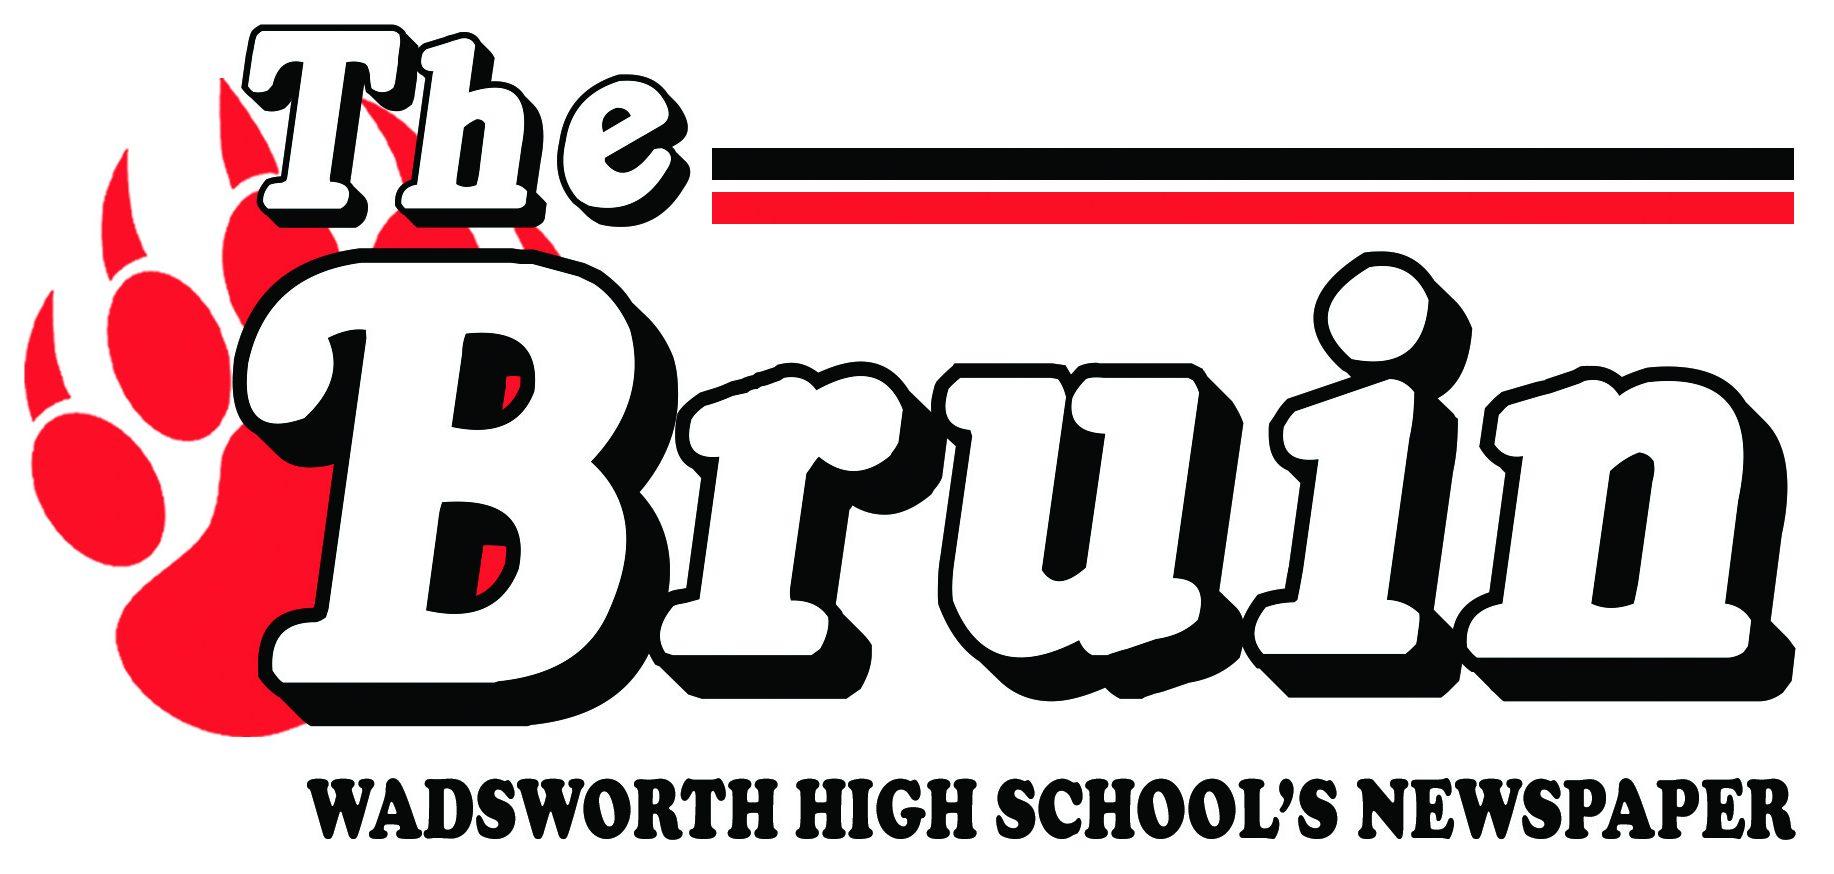 Wadsworth High School's Newspaper